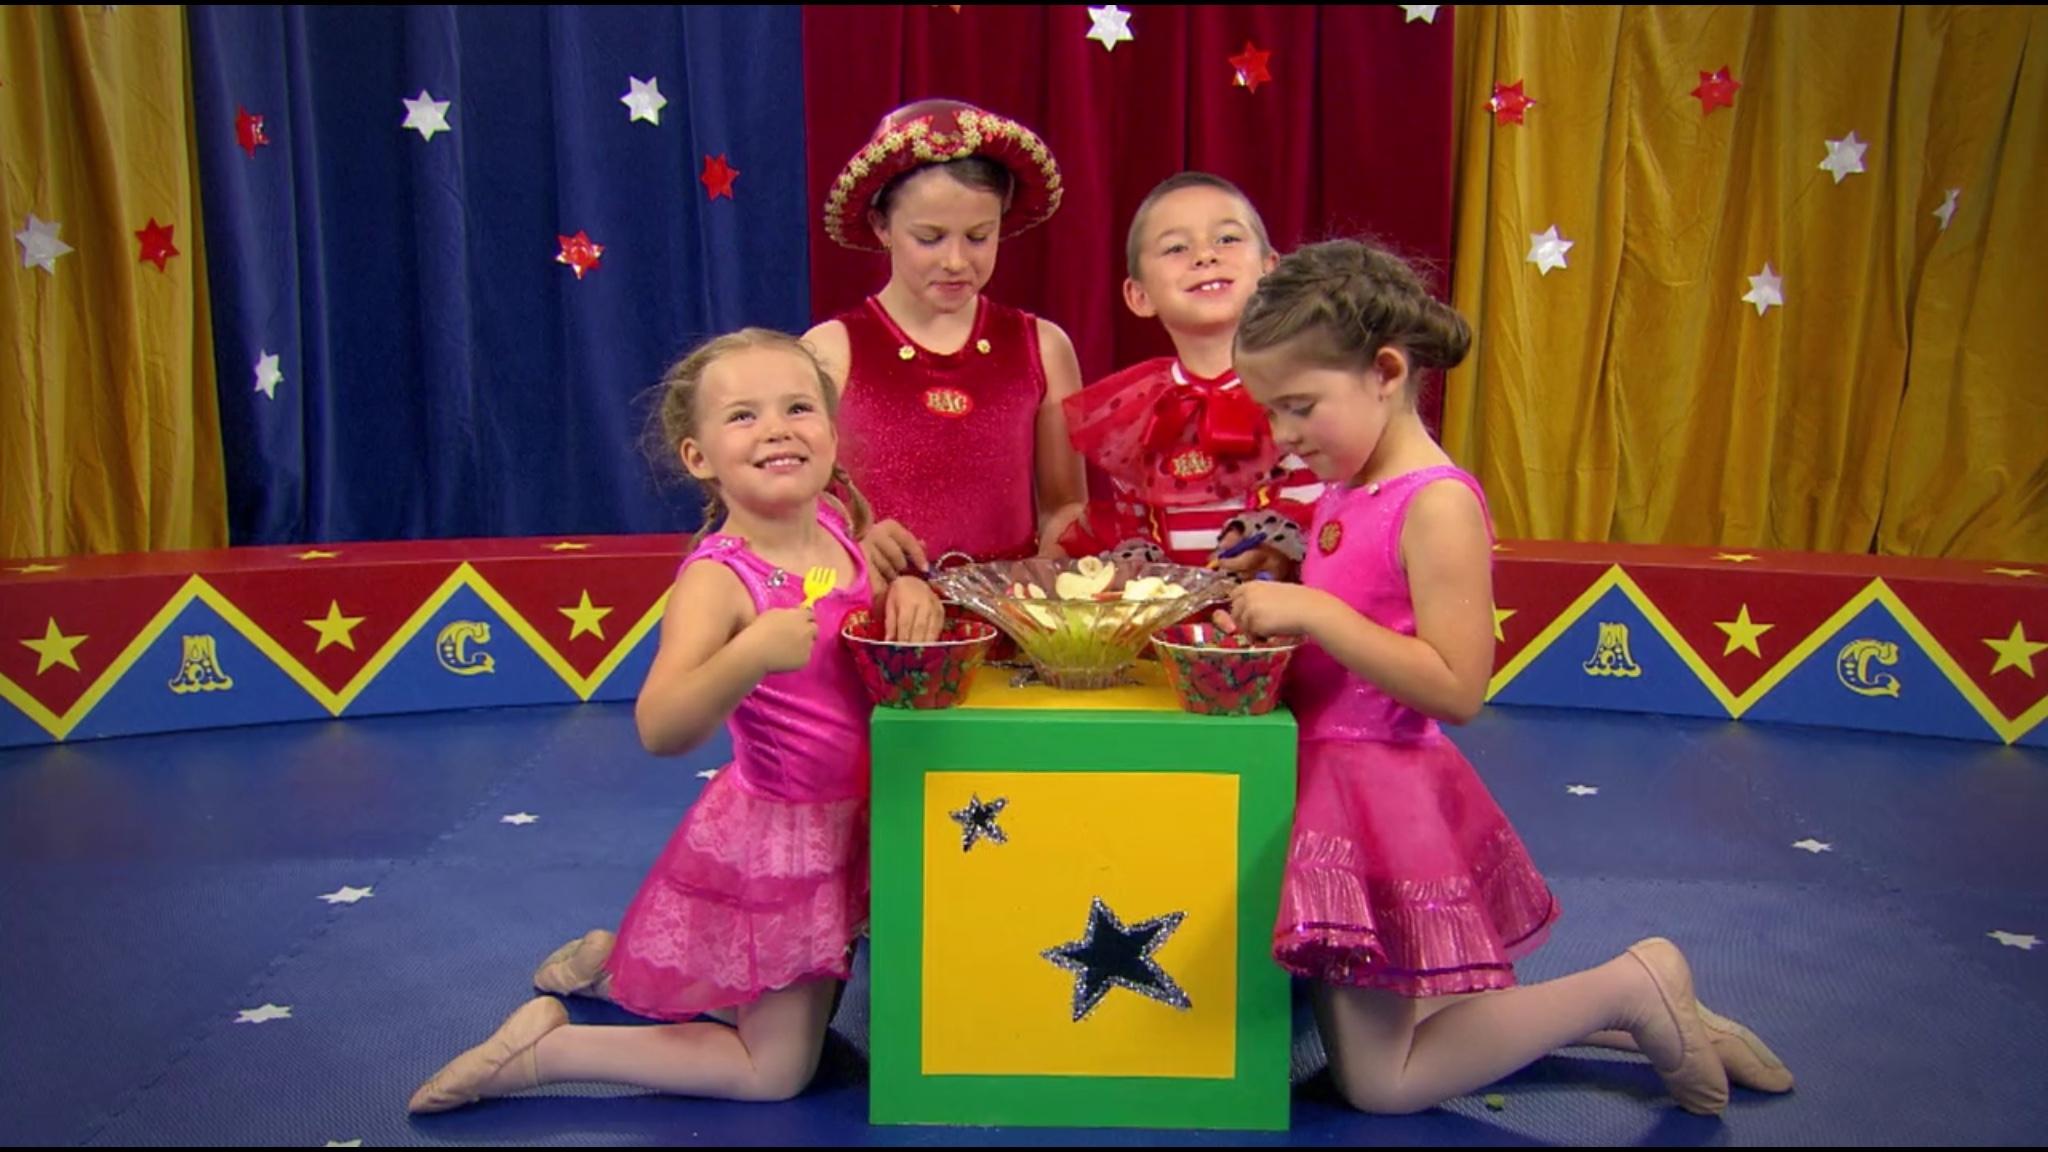 Fruit Salad (Baby Antonio's Circus episode)